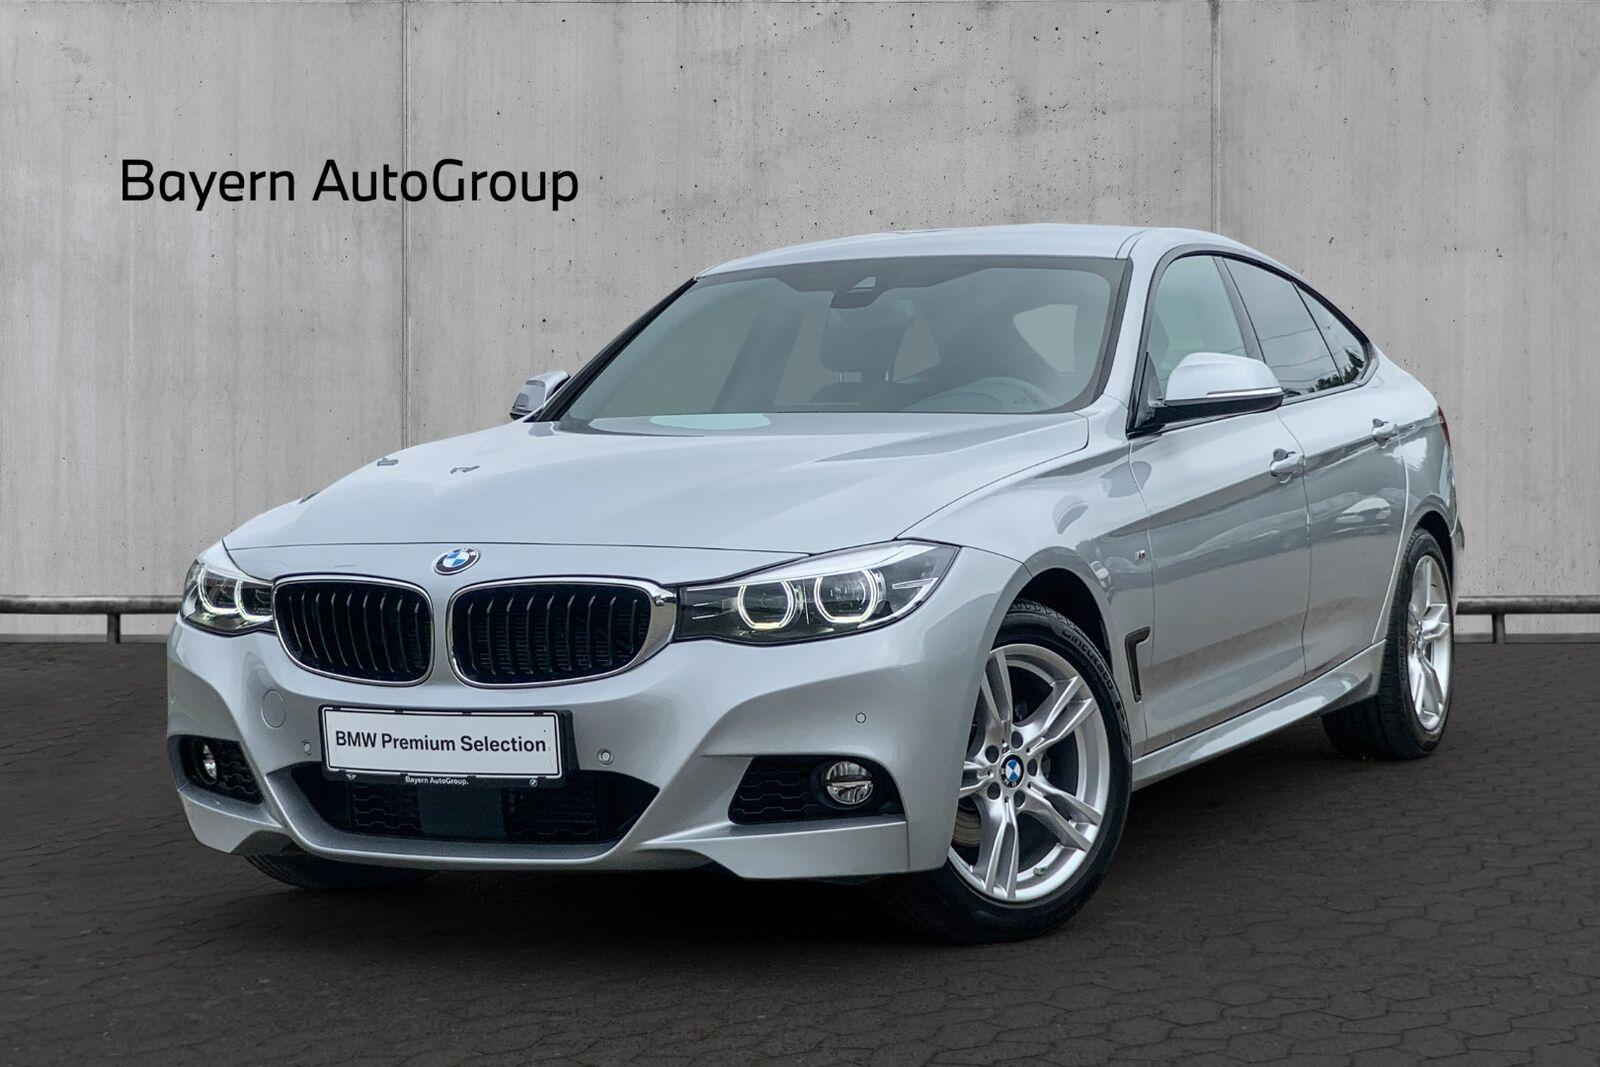 BMW 320d 2,0 Gran Turismo M-Sport xDrive au 5d - 449.900 kr.